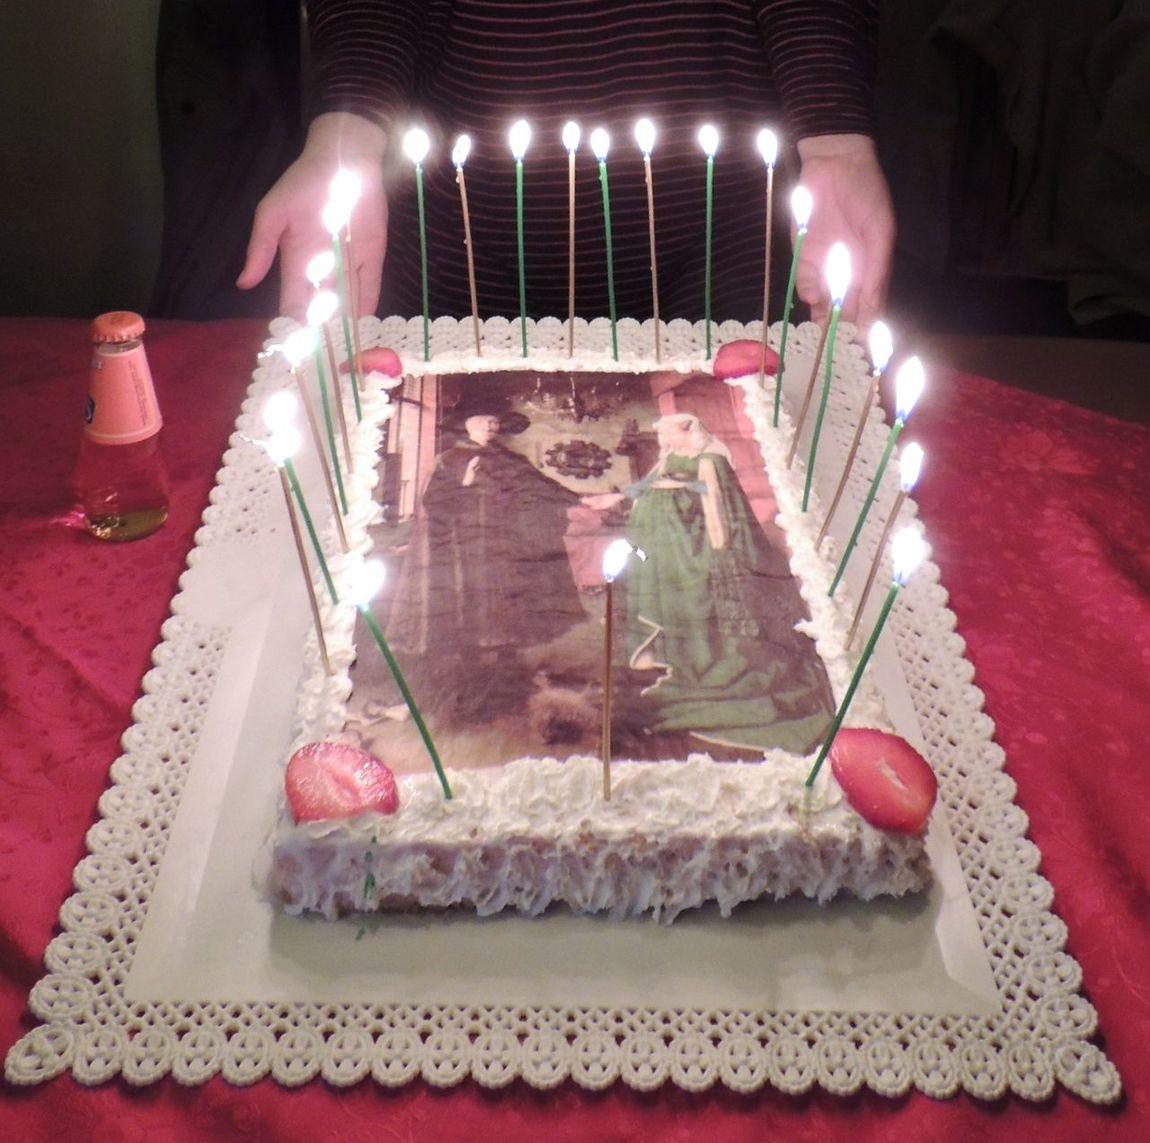 Birthday Cake Cakedesign Candles Happy :) Happybirthday🎉💗🙌 Happyhappynewyear Mycake